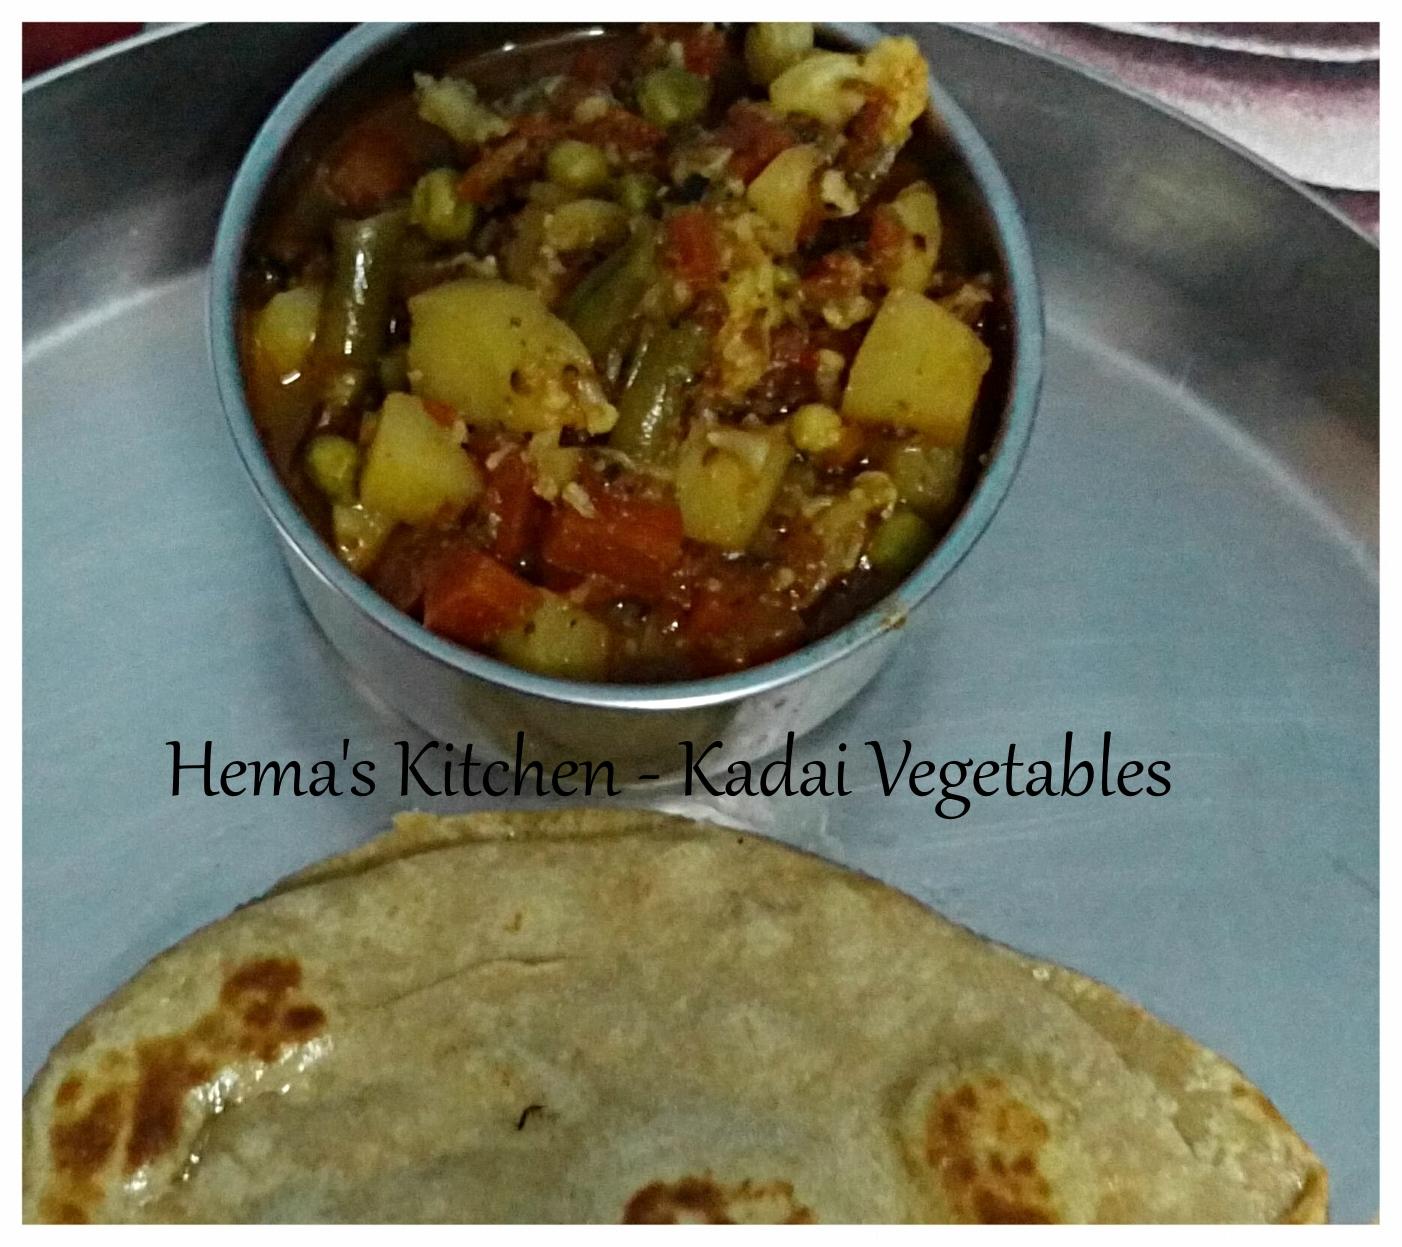 Kadai vegetables